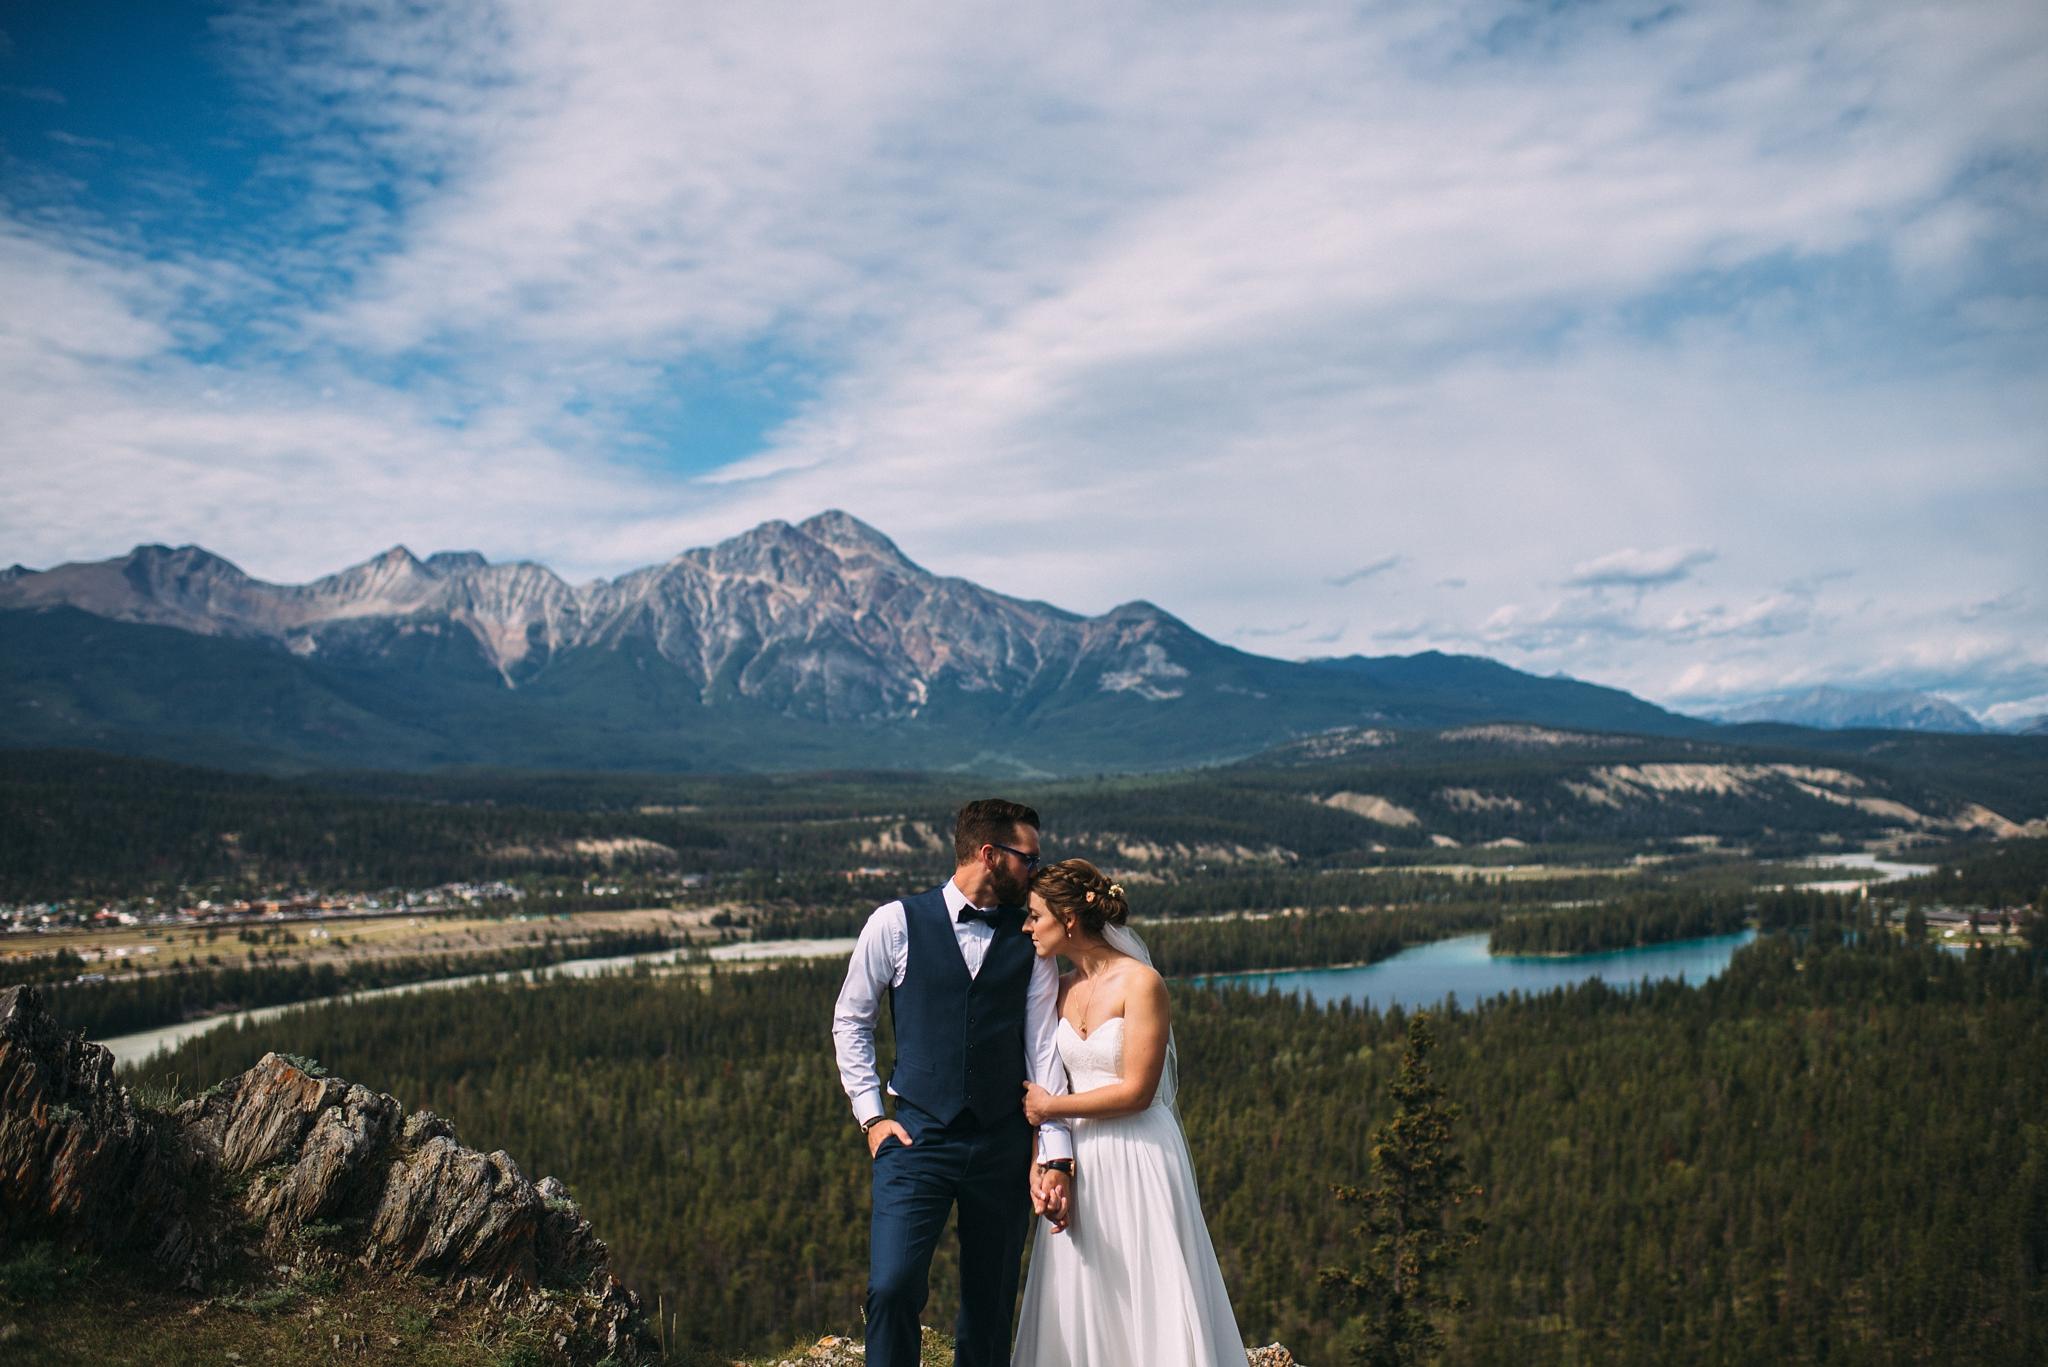 kaihla_tonai_intimate_wedding_elopement_photographer_2477